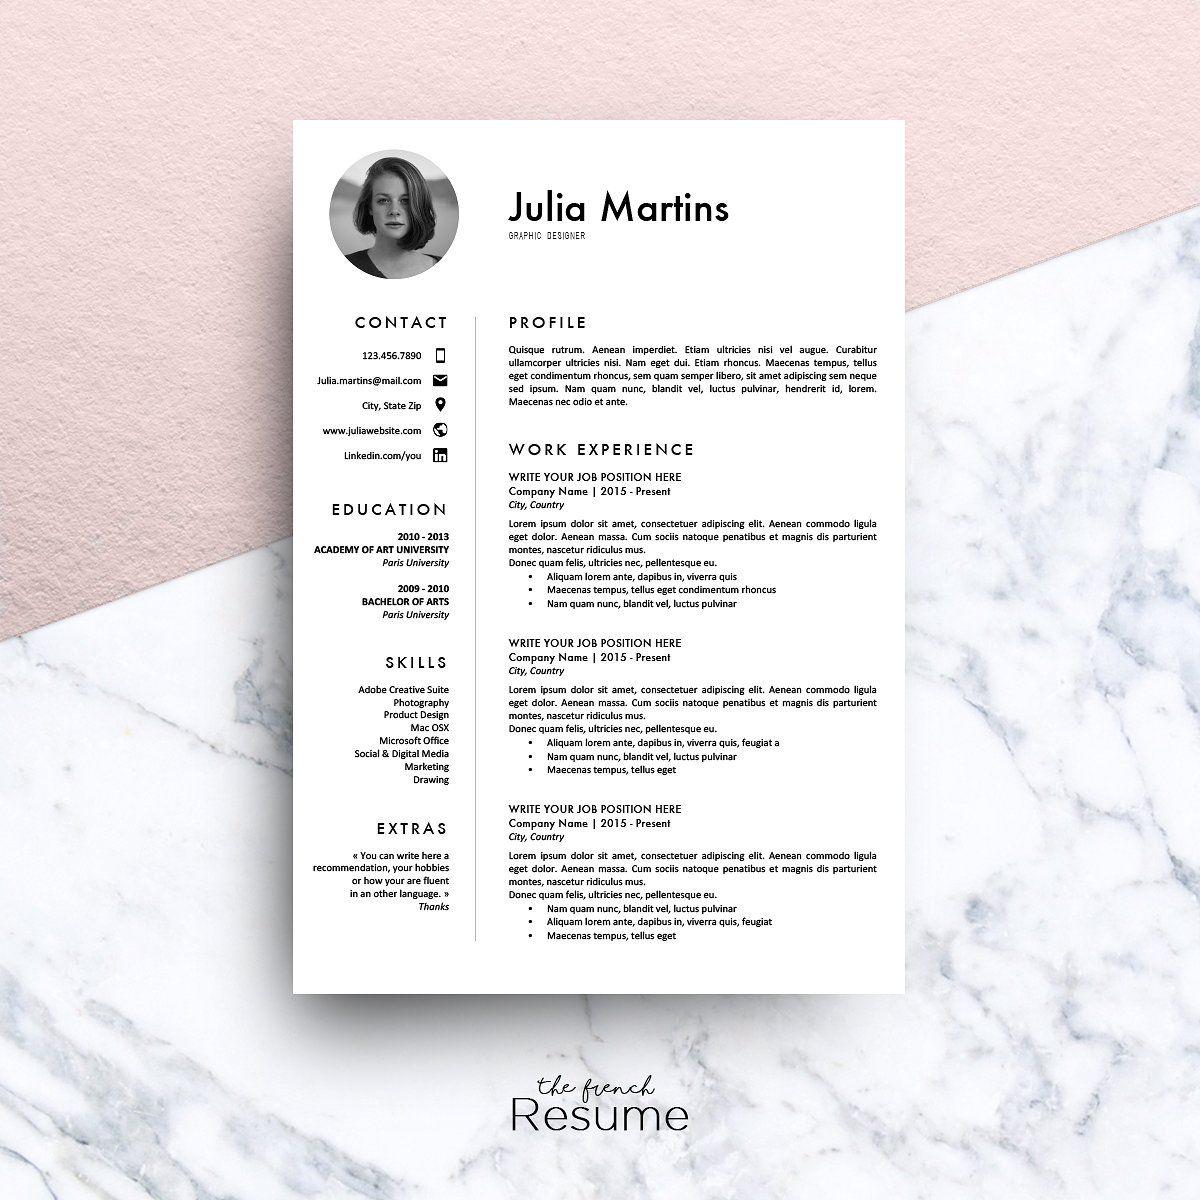 Resume Template Ms Word Julia Resume Template Creative Resume Templates Resume References